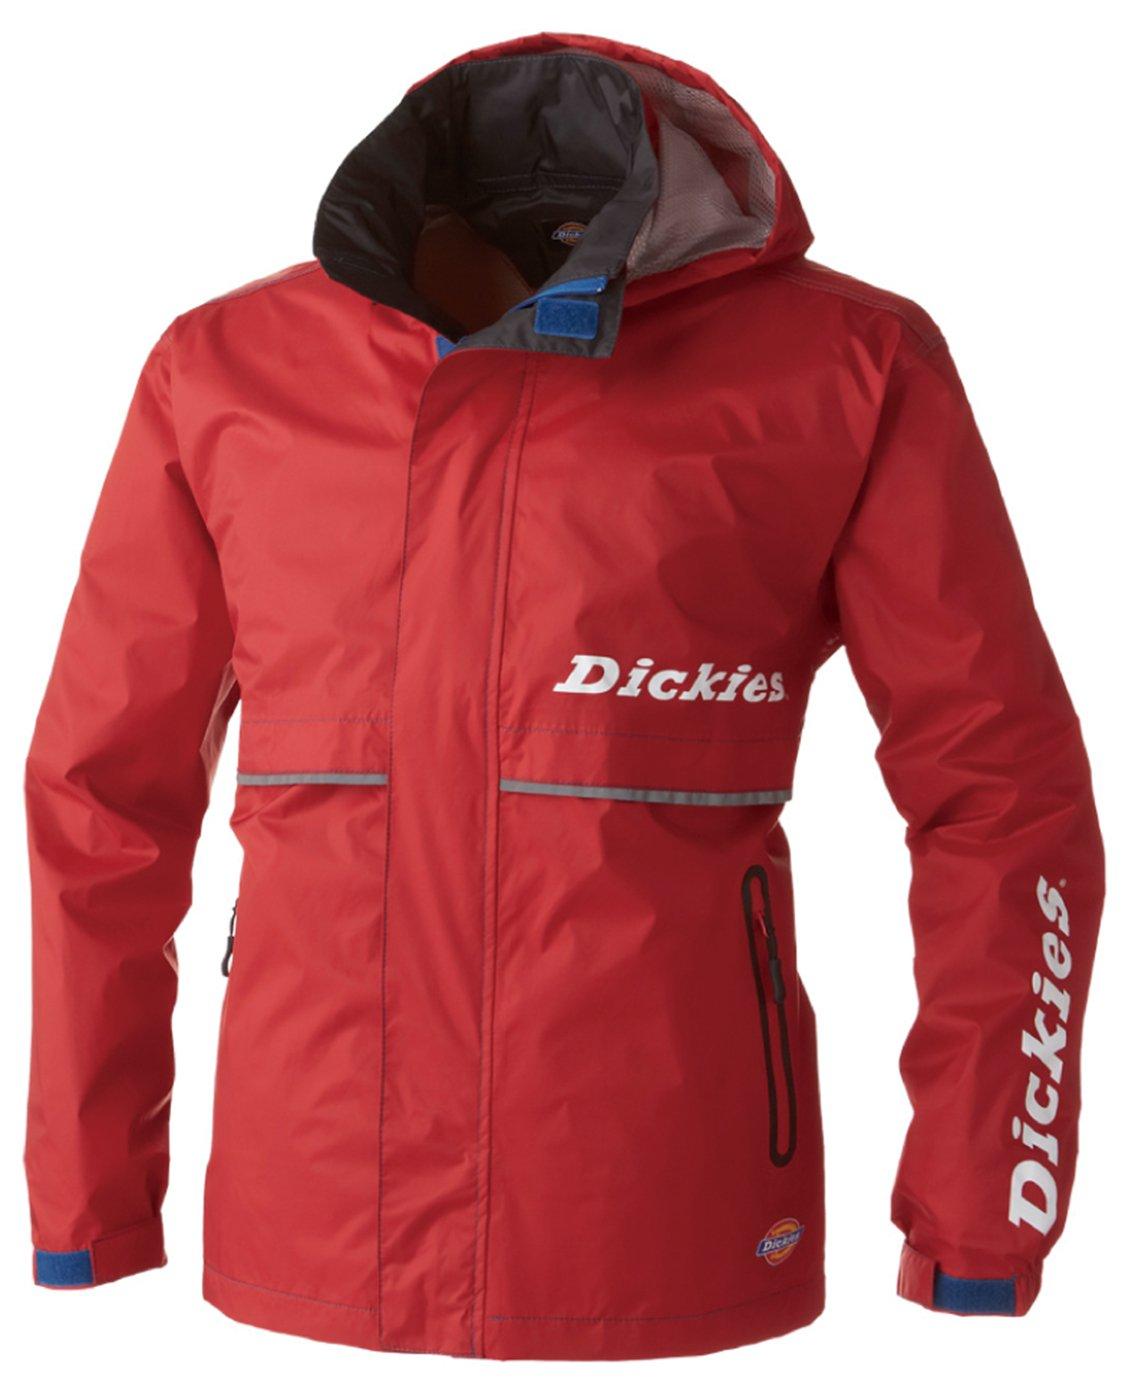 Dickies(ディッキーズ) Dickies レインウェア 上着 合羽 メンズ cc-d3505 B078TSK83F M|レッド レッド M